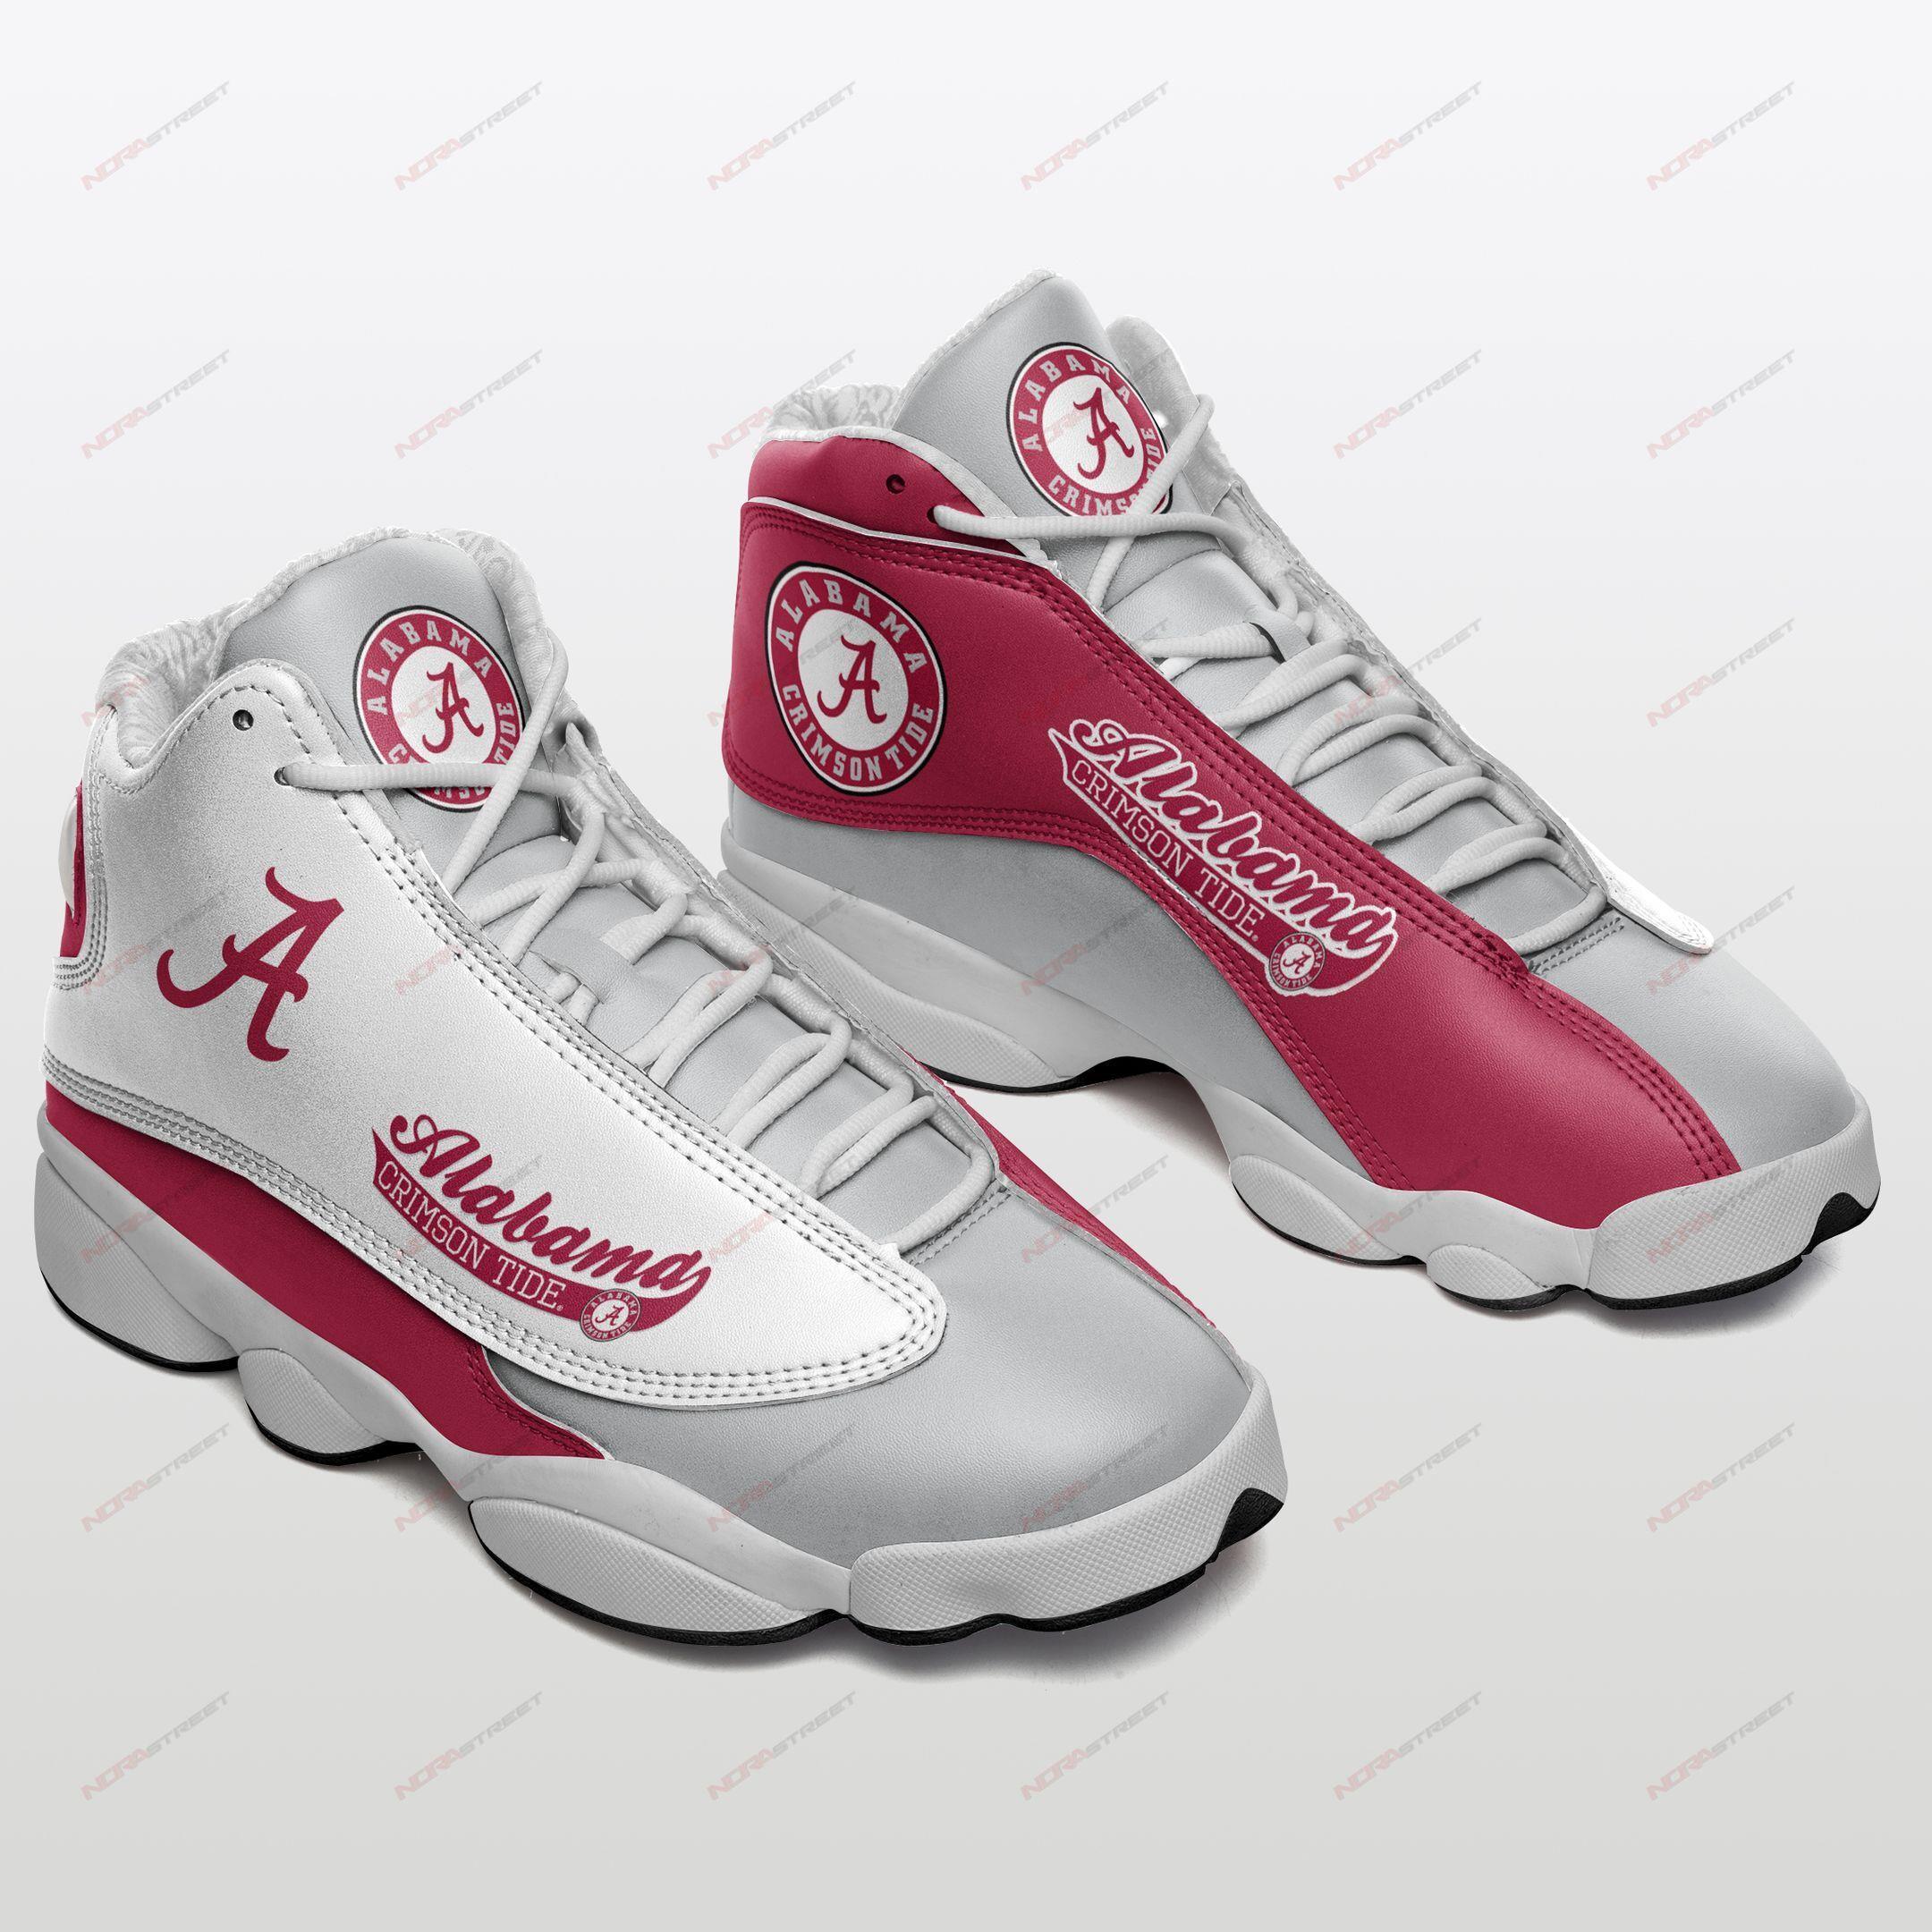 Alabama Crimson Tide Air Jordan 13 Sneakers Sport Shoes Plus Size